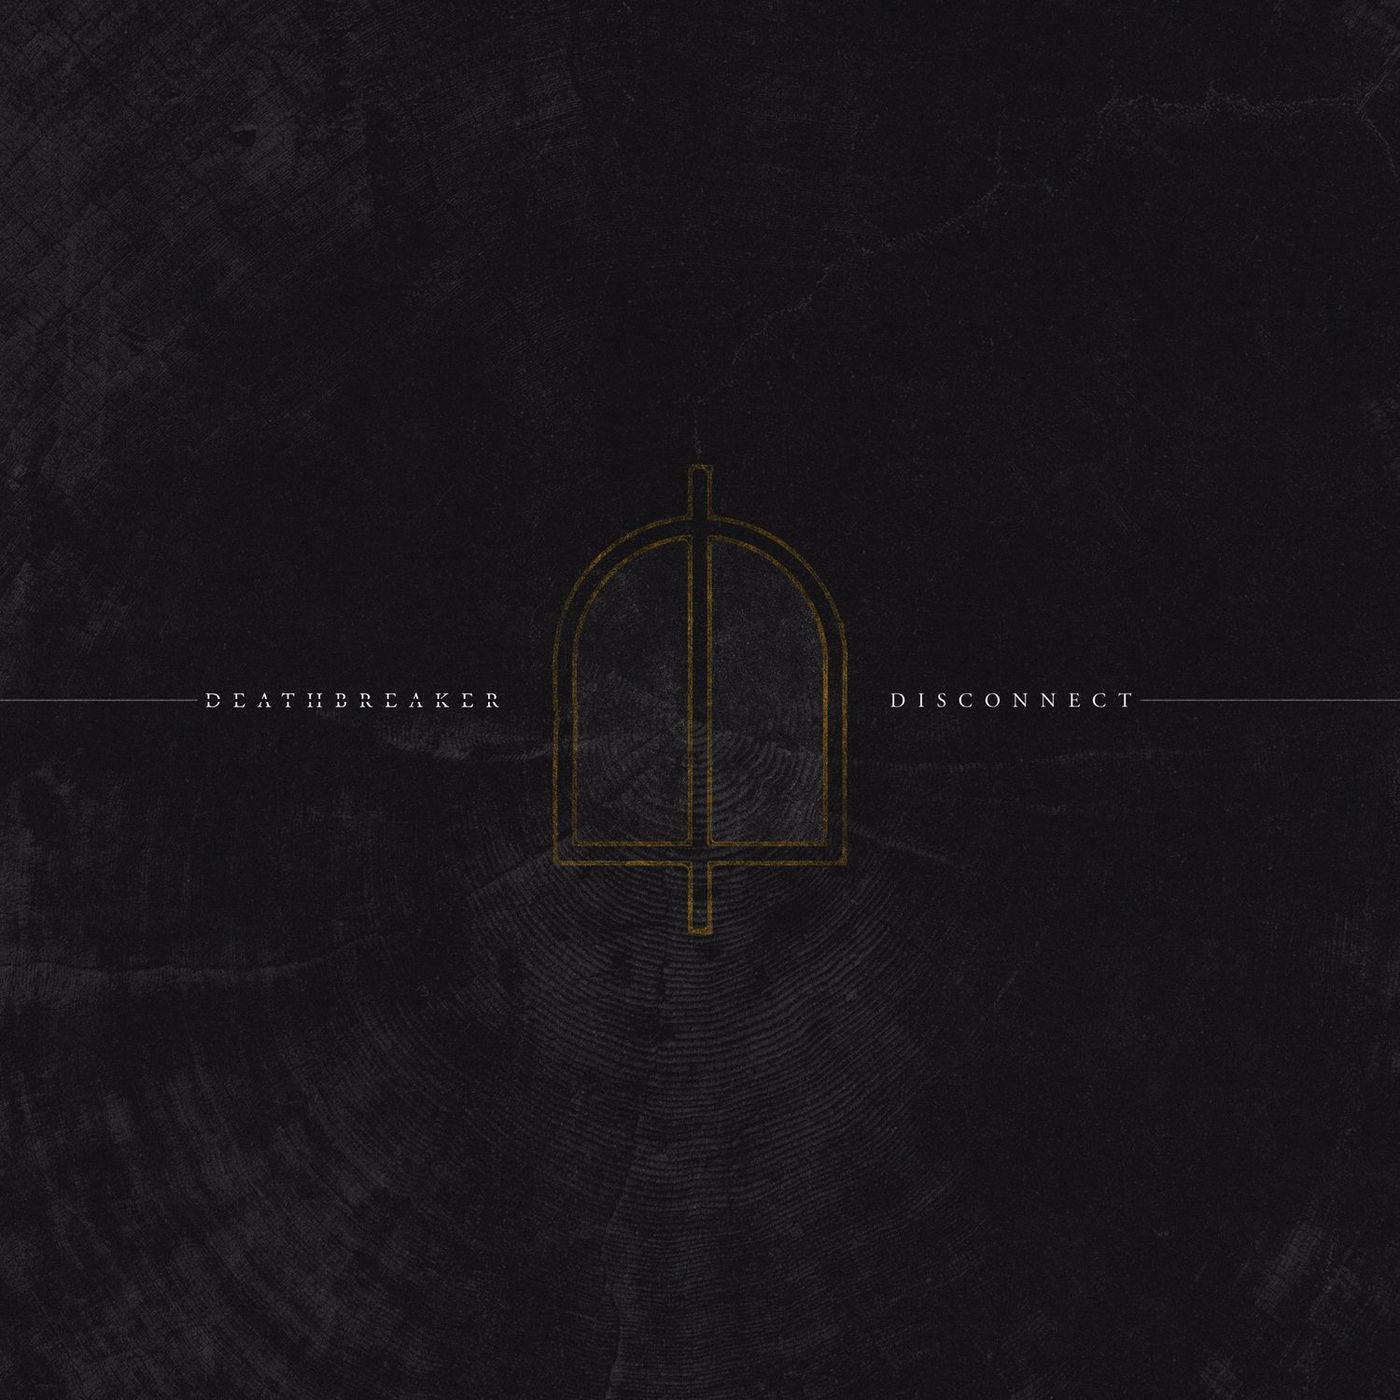 Deathbreaker - Disconnect (2017)